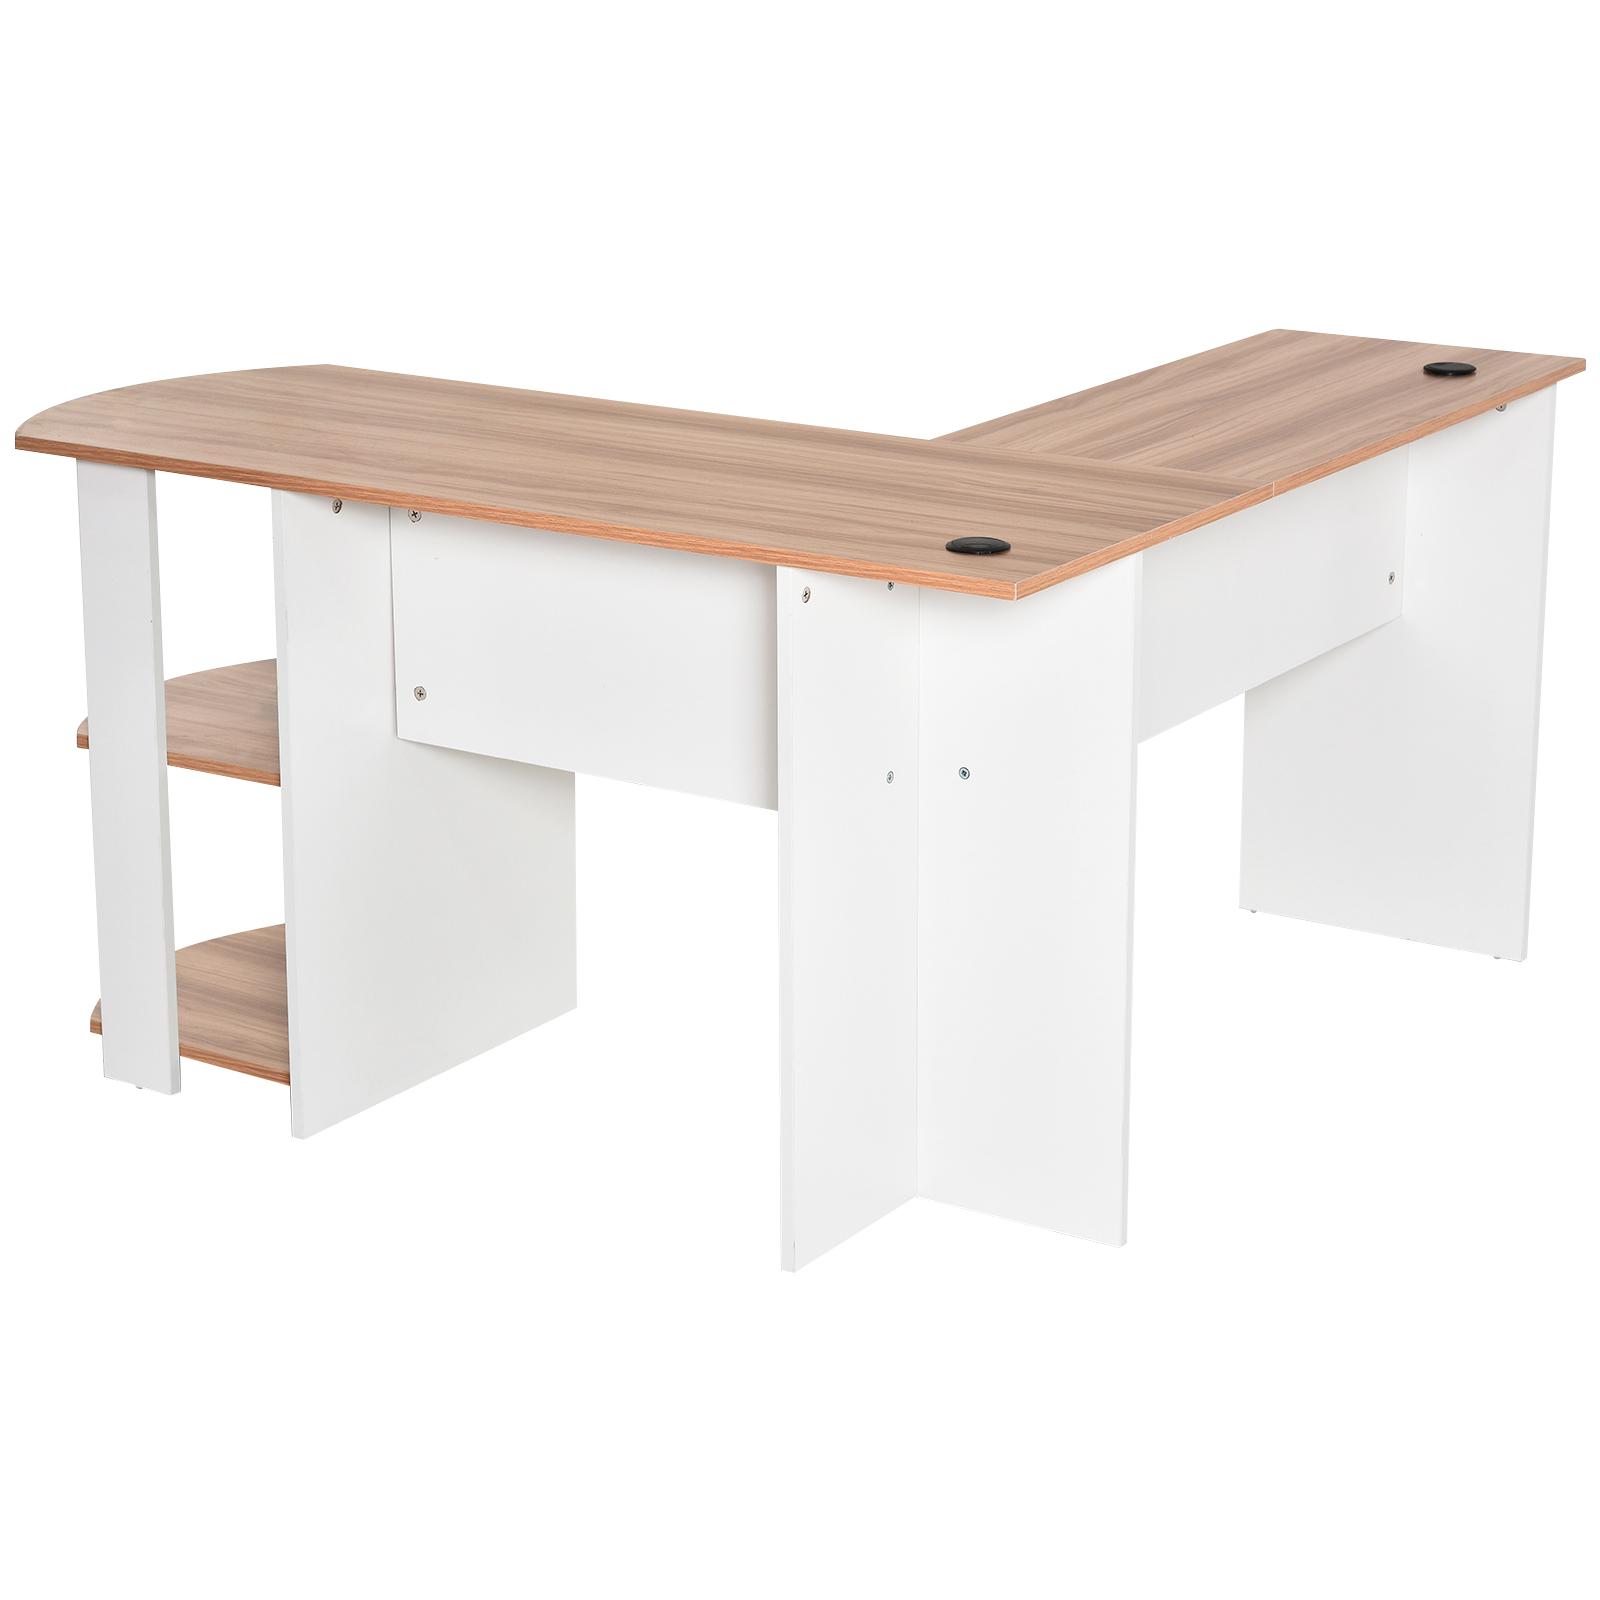 Mesa-de-Ordenador-PC-Escritorio-para-Oficina-Hogar-Esquinera-Forma-L-Madera miniatura 24